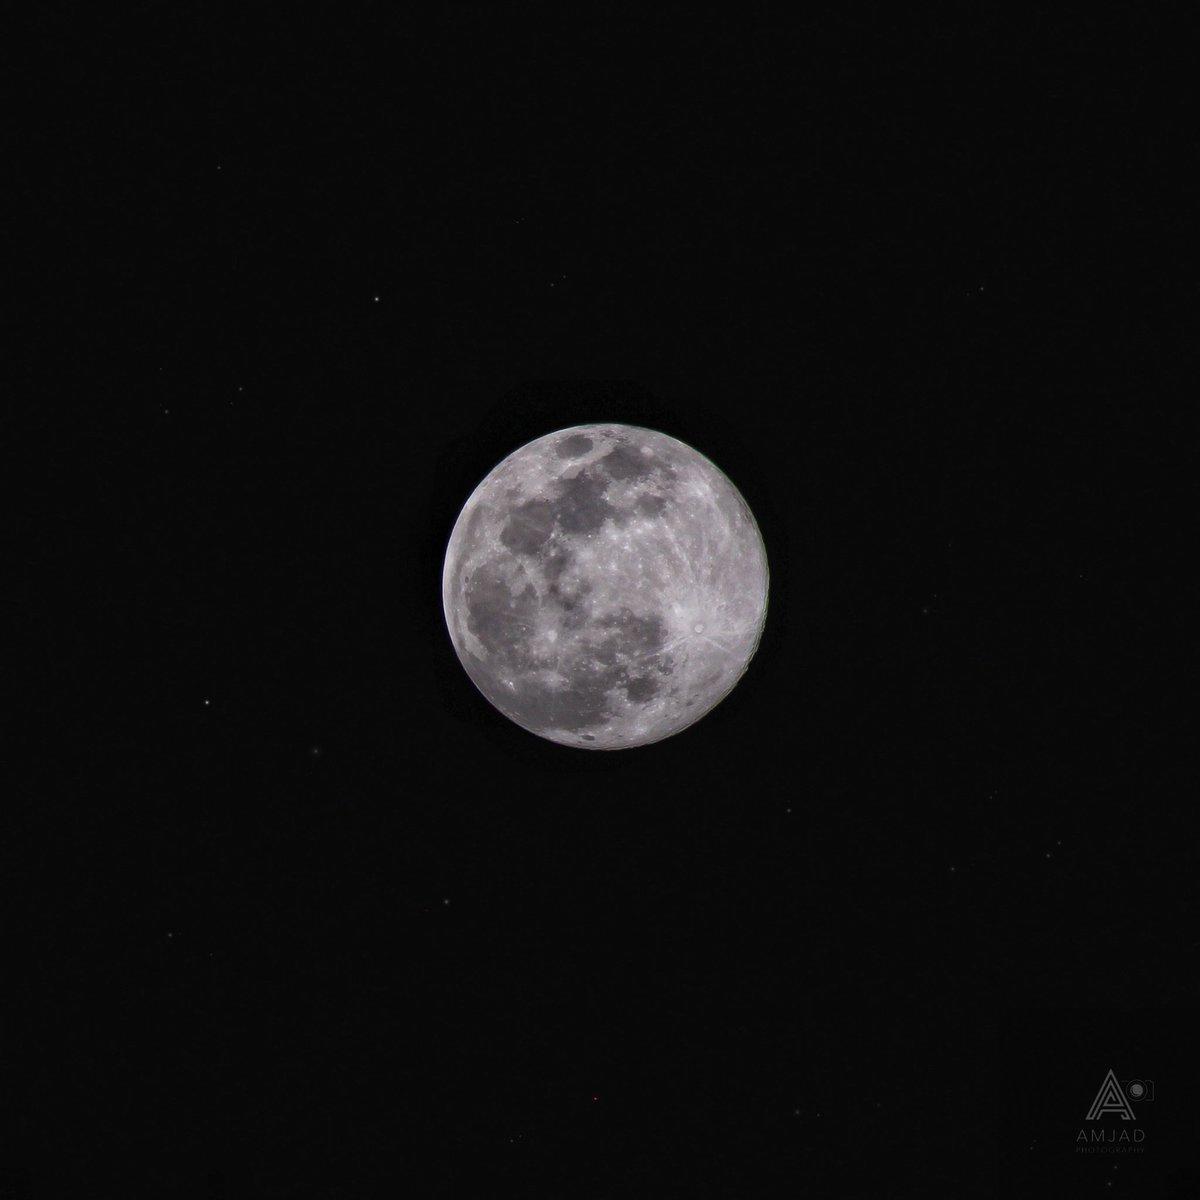 """قمرٌ تفرّد بالمحاسن كلها""  #supermoon2020 pic.twitter.com/yOEd34DV8n"